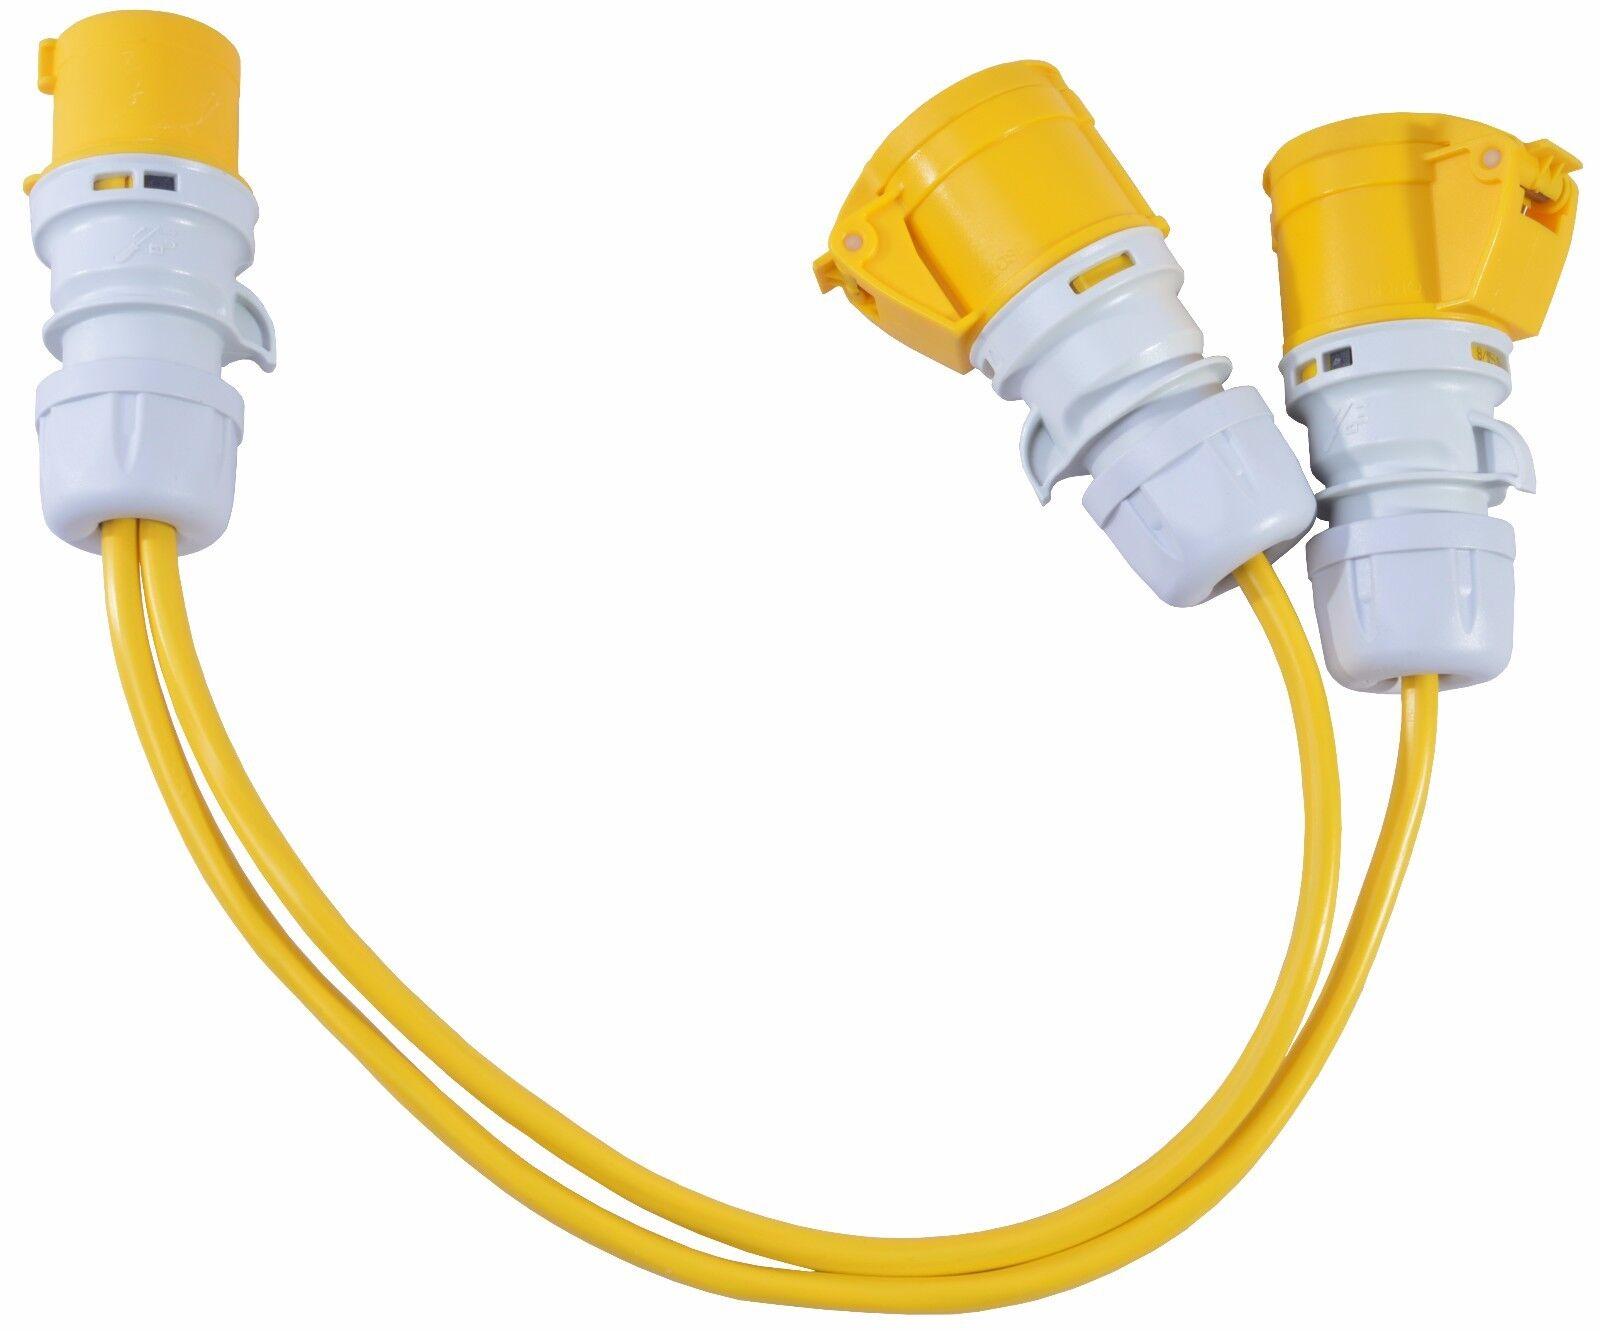 16 Amp Marina Mains Plug 3 Way Splitter